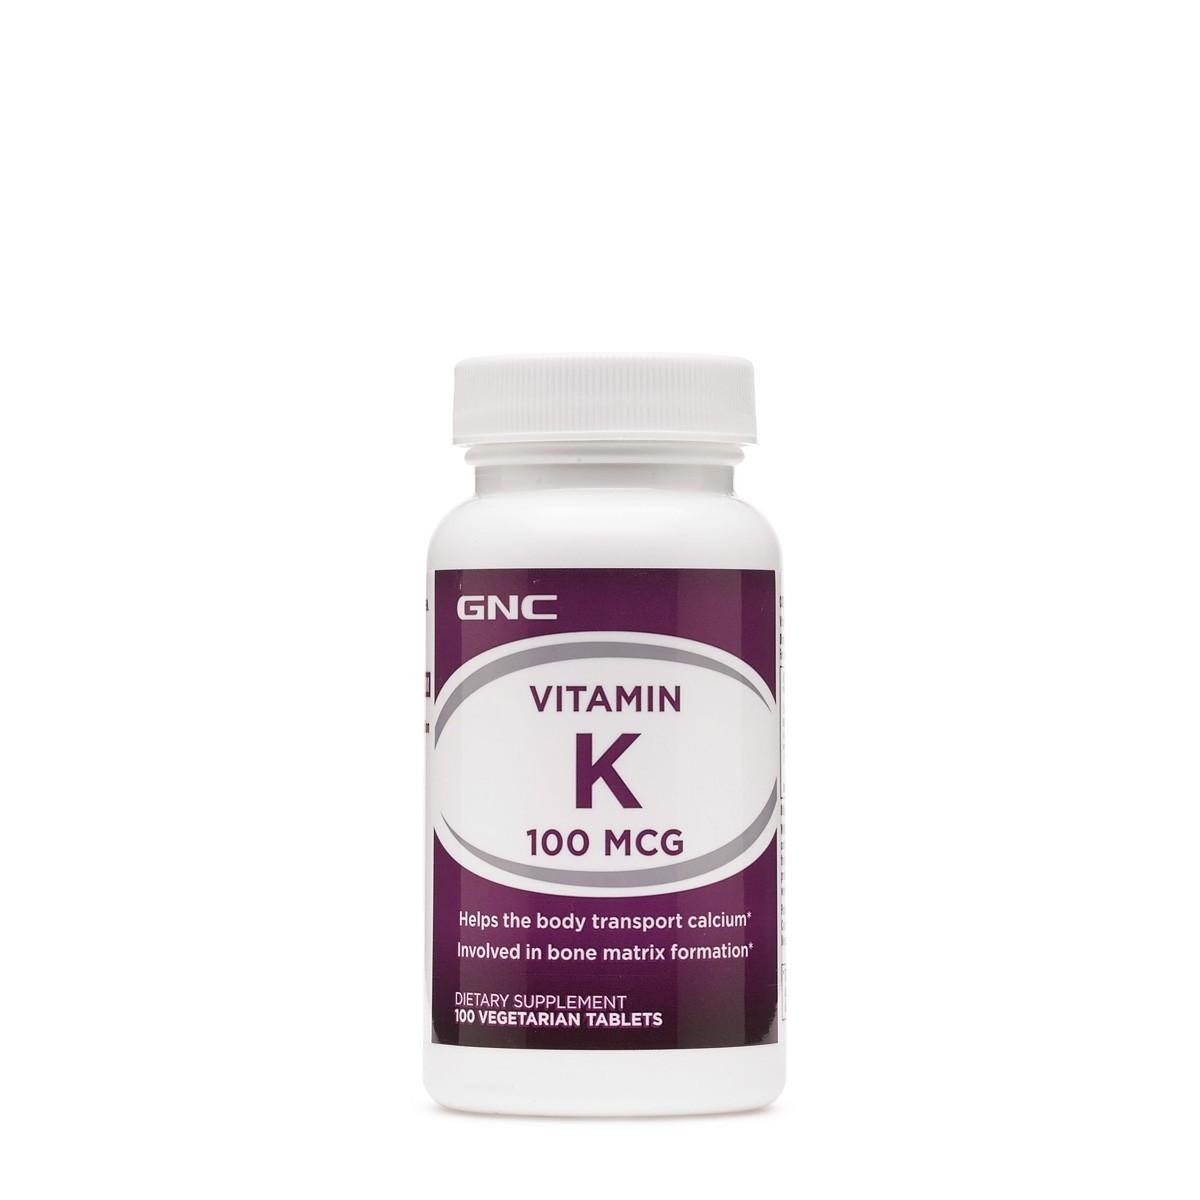 GNC Vitamin K 100 mcg, Vitamina K, 100 tb